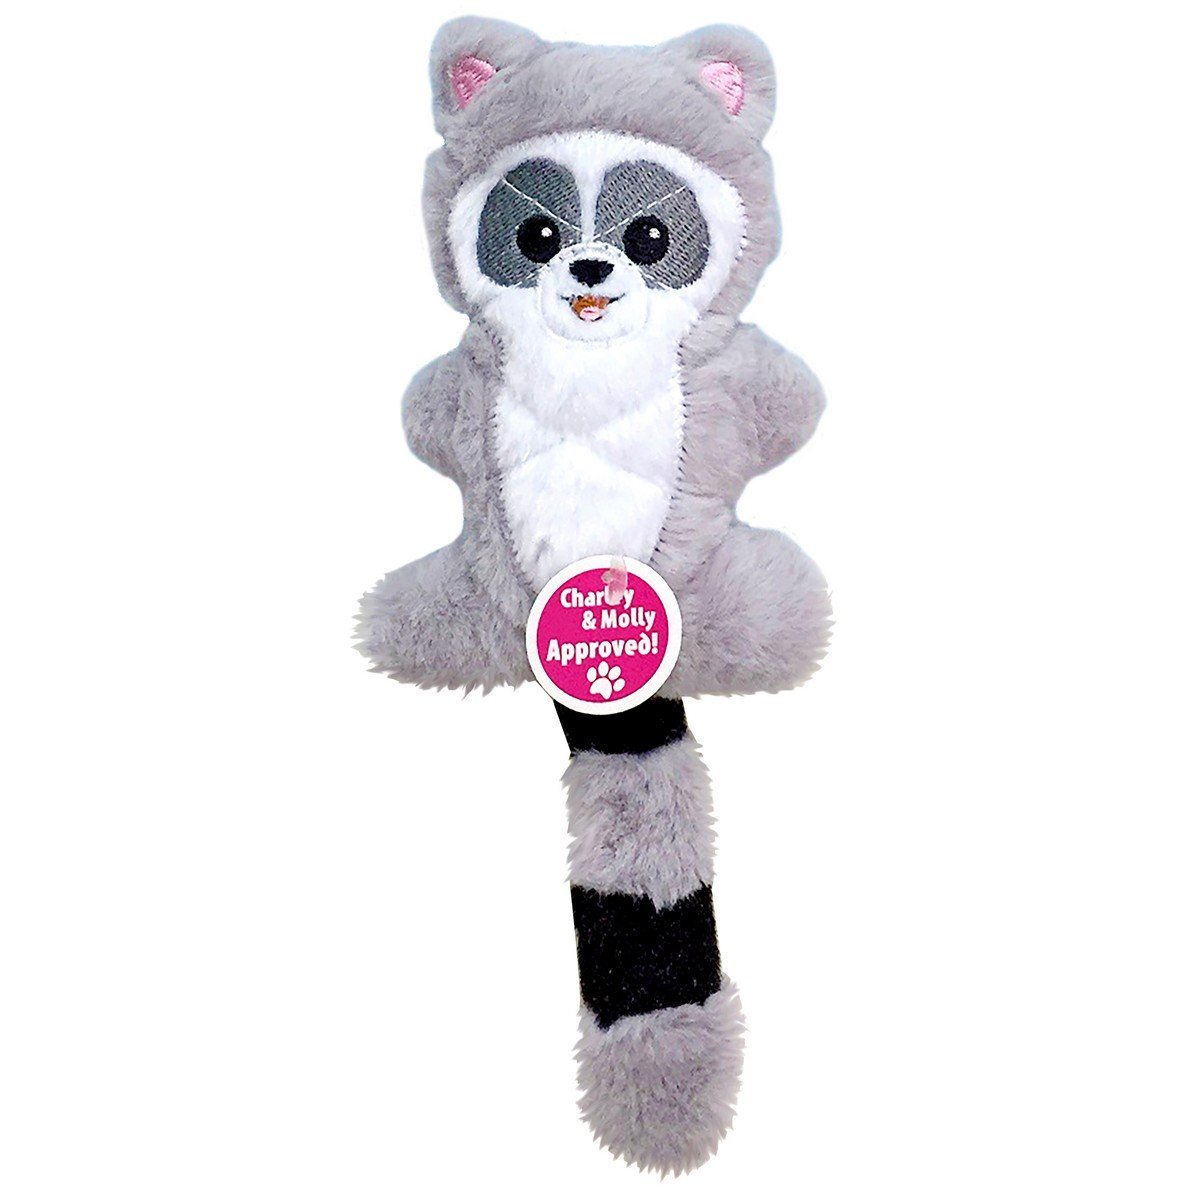 Afbeelding van Charley & Molley Comfort Layered Raccoon 19cm